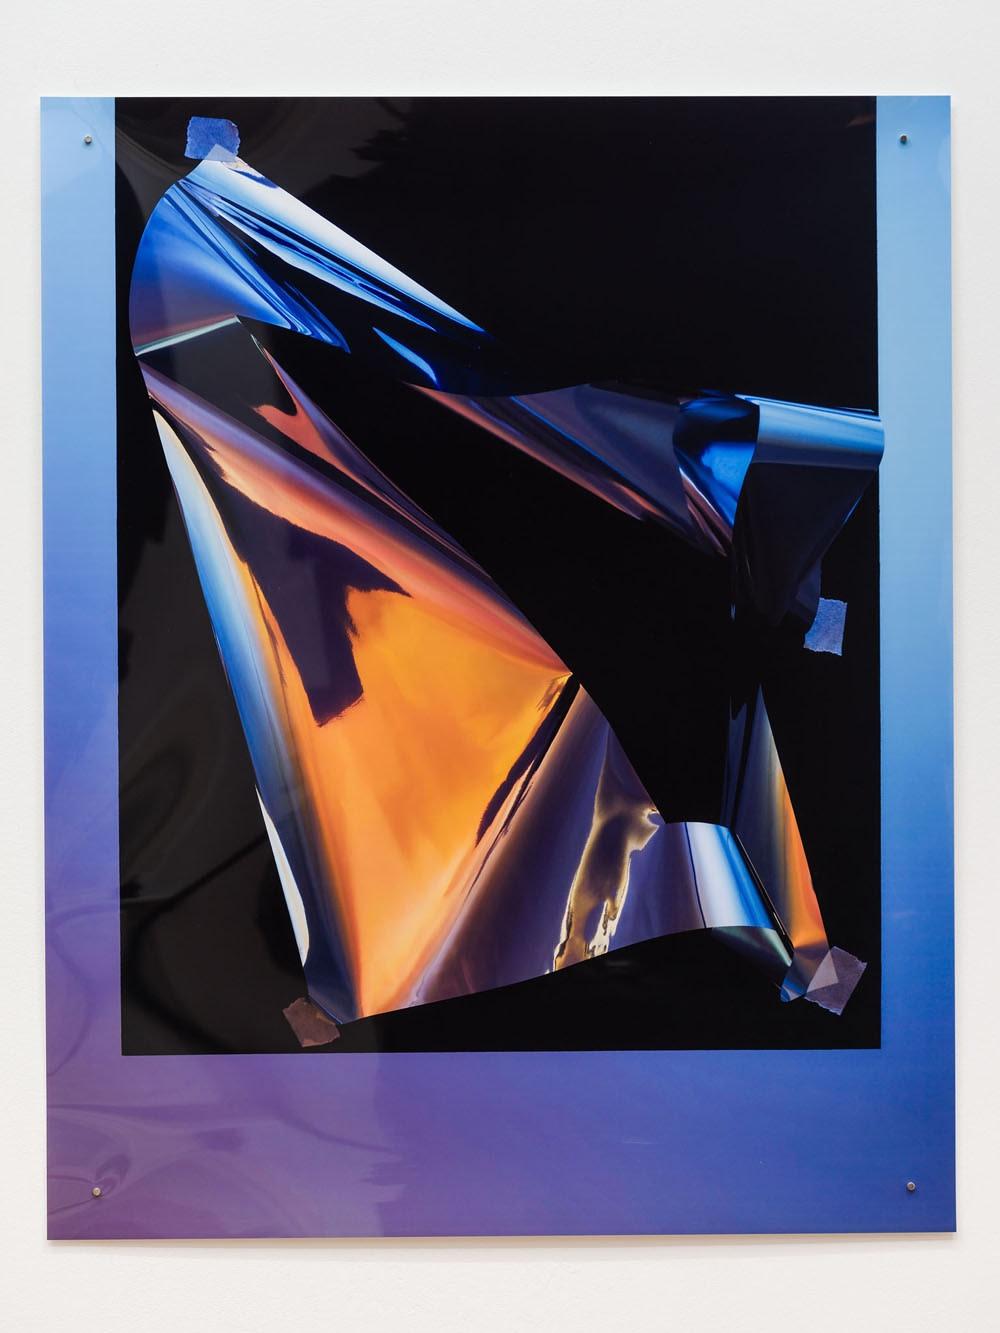 <span class=&#34;link fancybox-details-link&#34;><a href=&#34;/artists/8-joe-clark/works/9347/&#34;>View Detail Page</a></span><div class=&#34;artist&#34;><strong>Joe Clark</strong></div> <div class=&#34;title&#34;><em>What magic</em>, 2015</div> <div class=&#34;medium&#34;>Fujiflex C-type print</div> <div class=&#34;dimensions&#34;>48 x 60 cm<br />18 7/8 x 23 5/8 in</div><div class=&#34;copyright_line&#34;>Copyright The Artist</div>